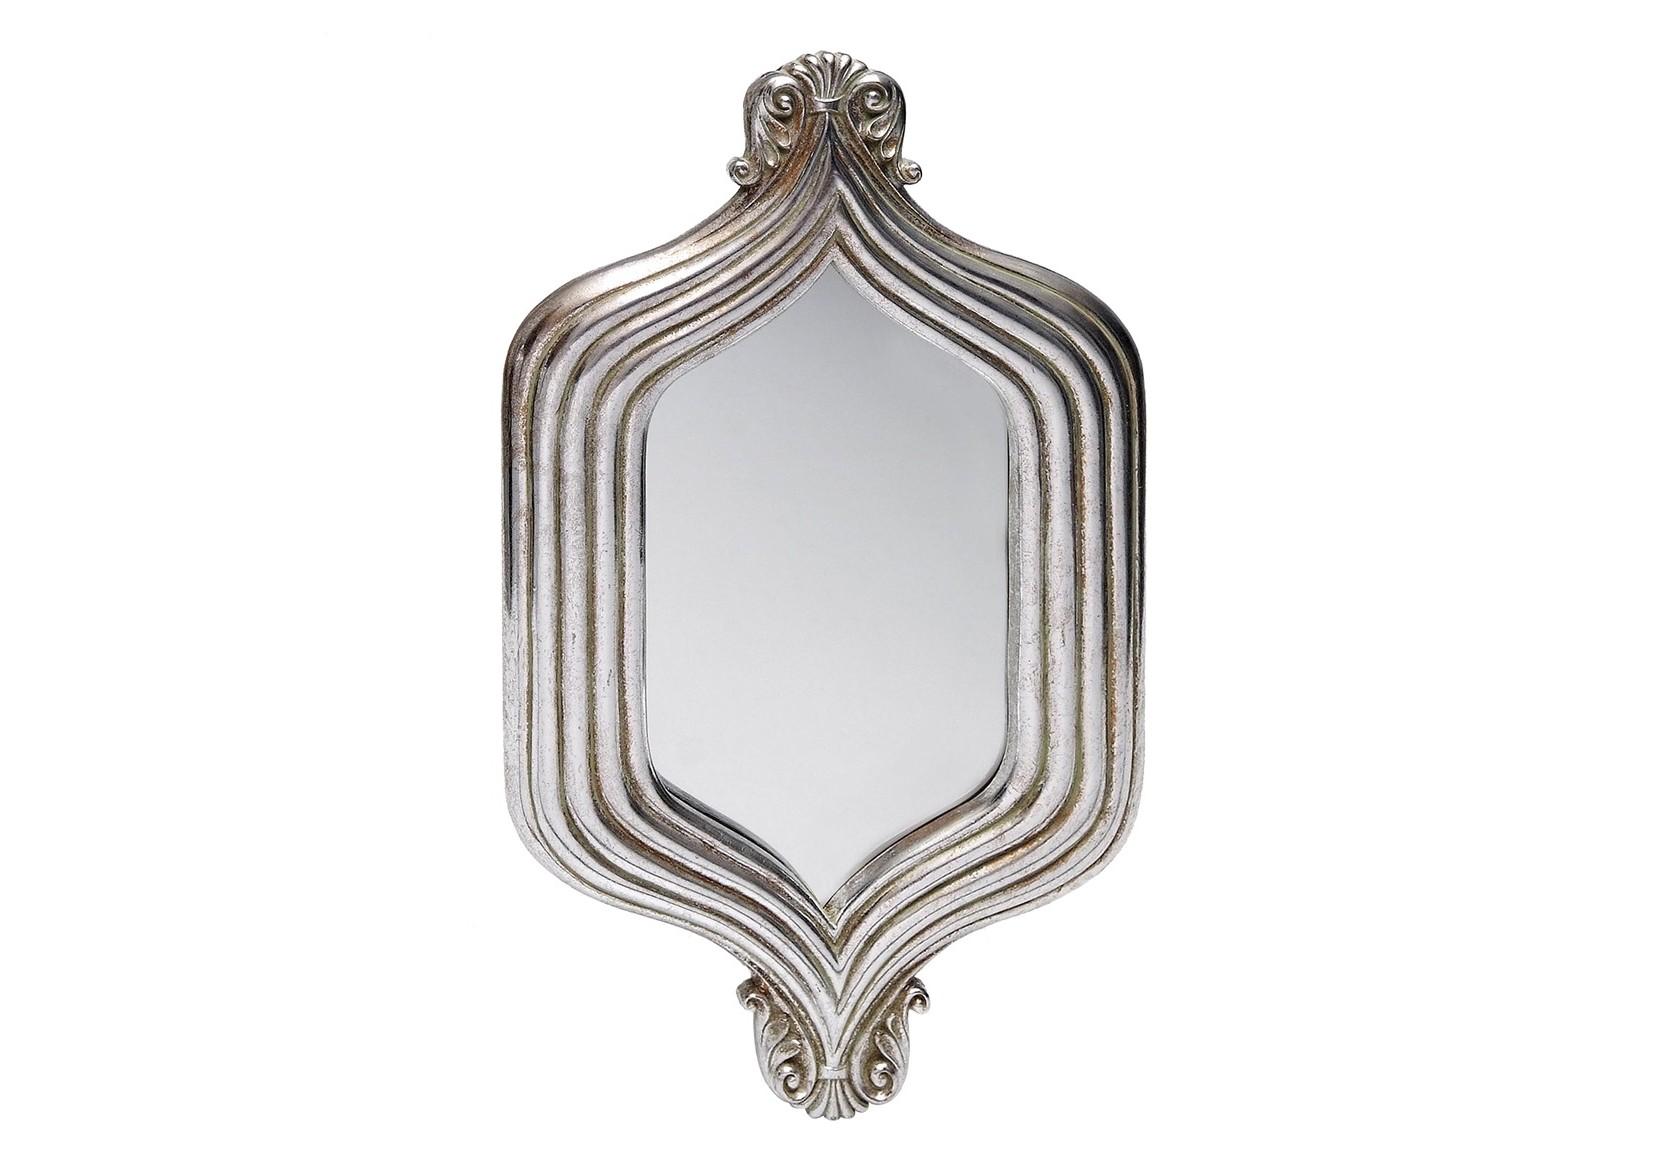 Настенное зеркалоНастенные зеркала<br><br><br>Material: Пластик<br>Length см: None<br>Width см: 25<br>Depth см: 7<br>Height см: 42